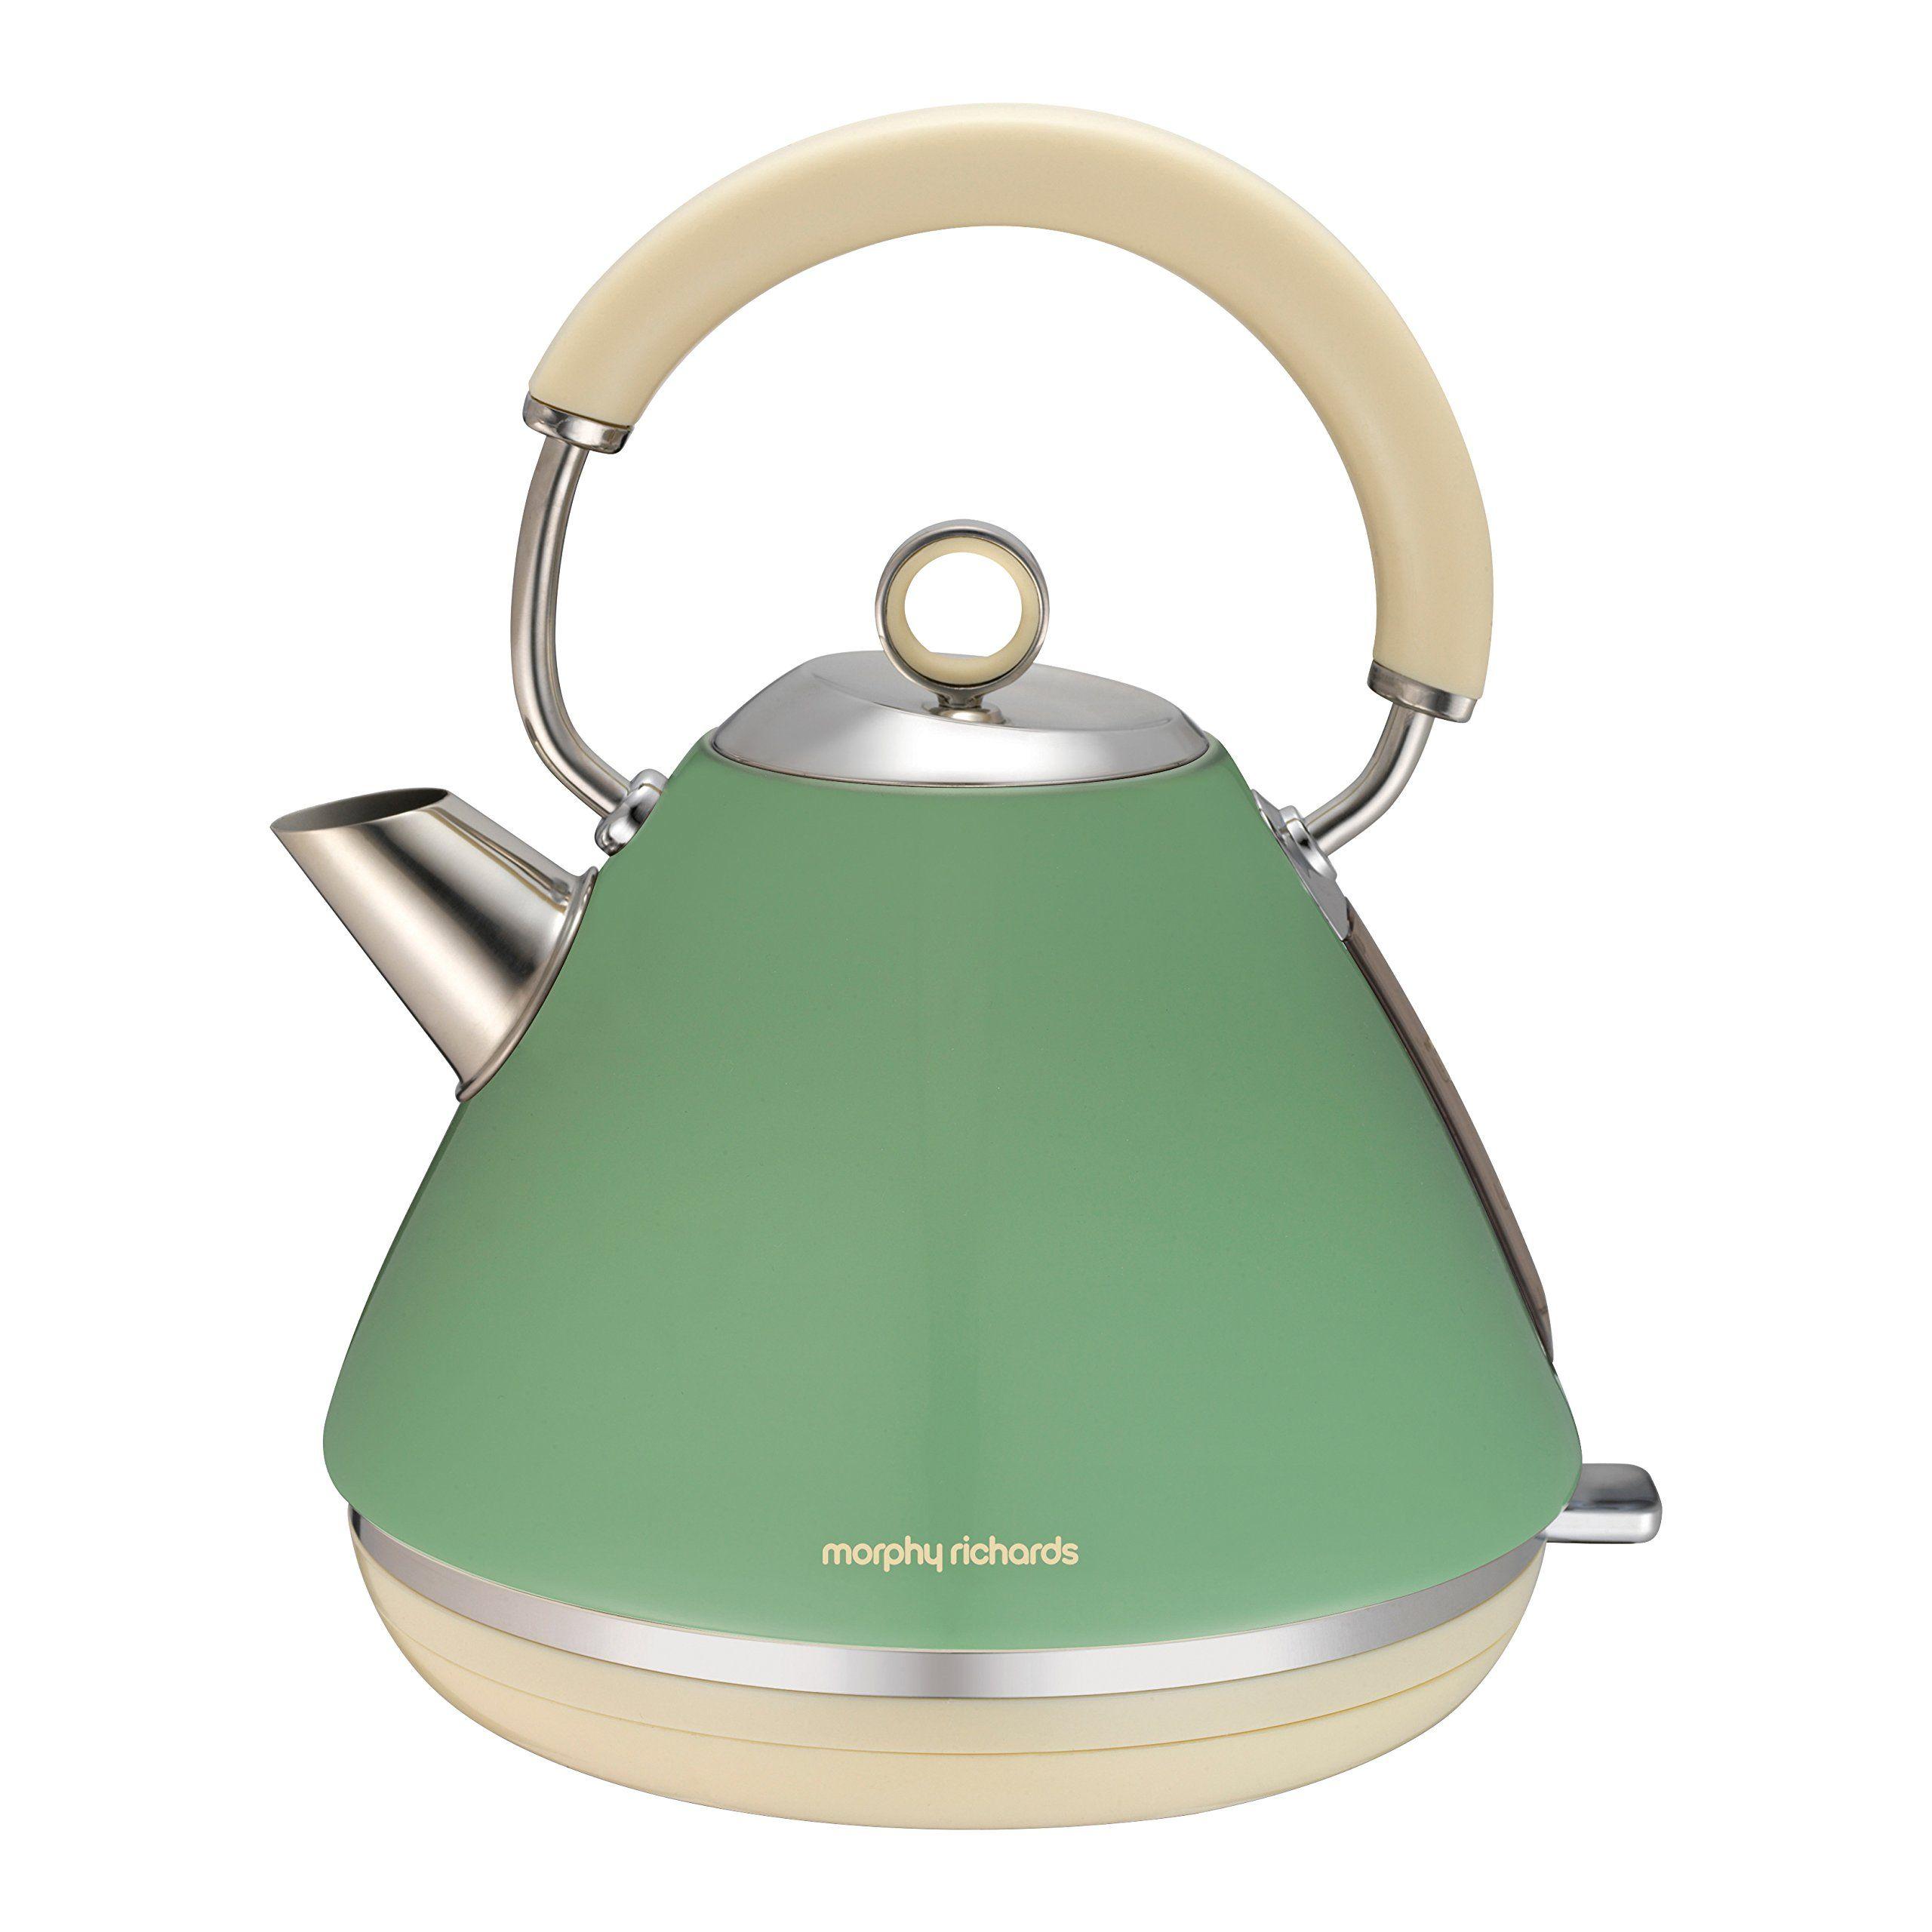 morphy richards 102011 kettle amazon co uk kitchen home dining